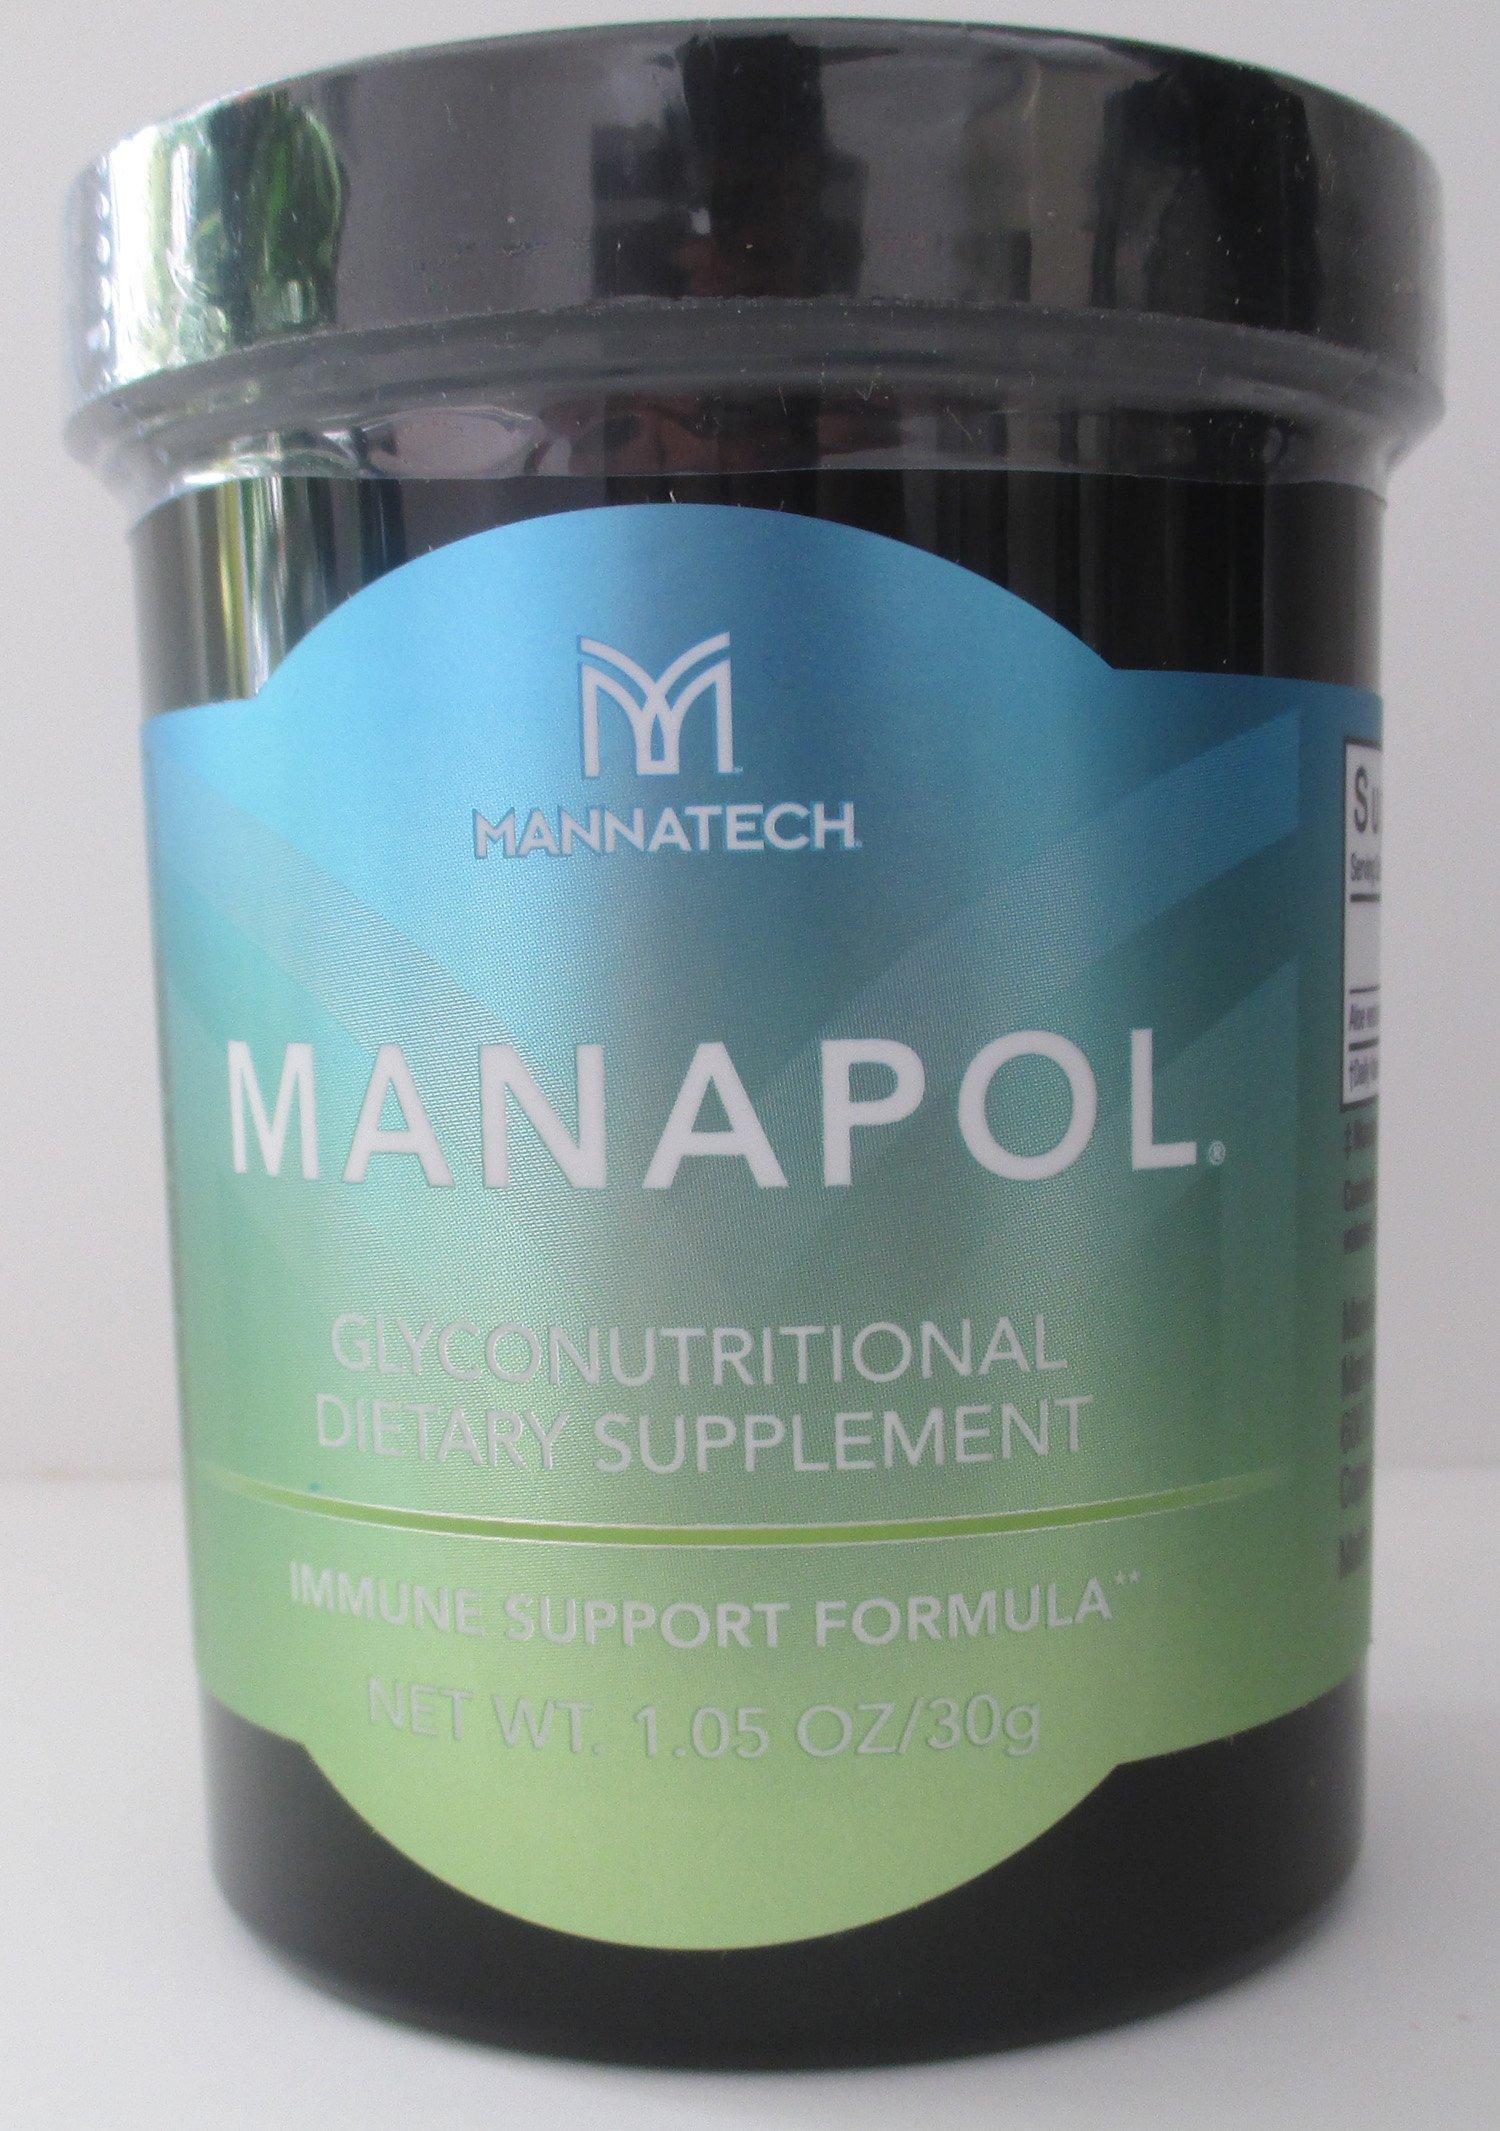 Mannatech Manapol 30g powder